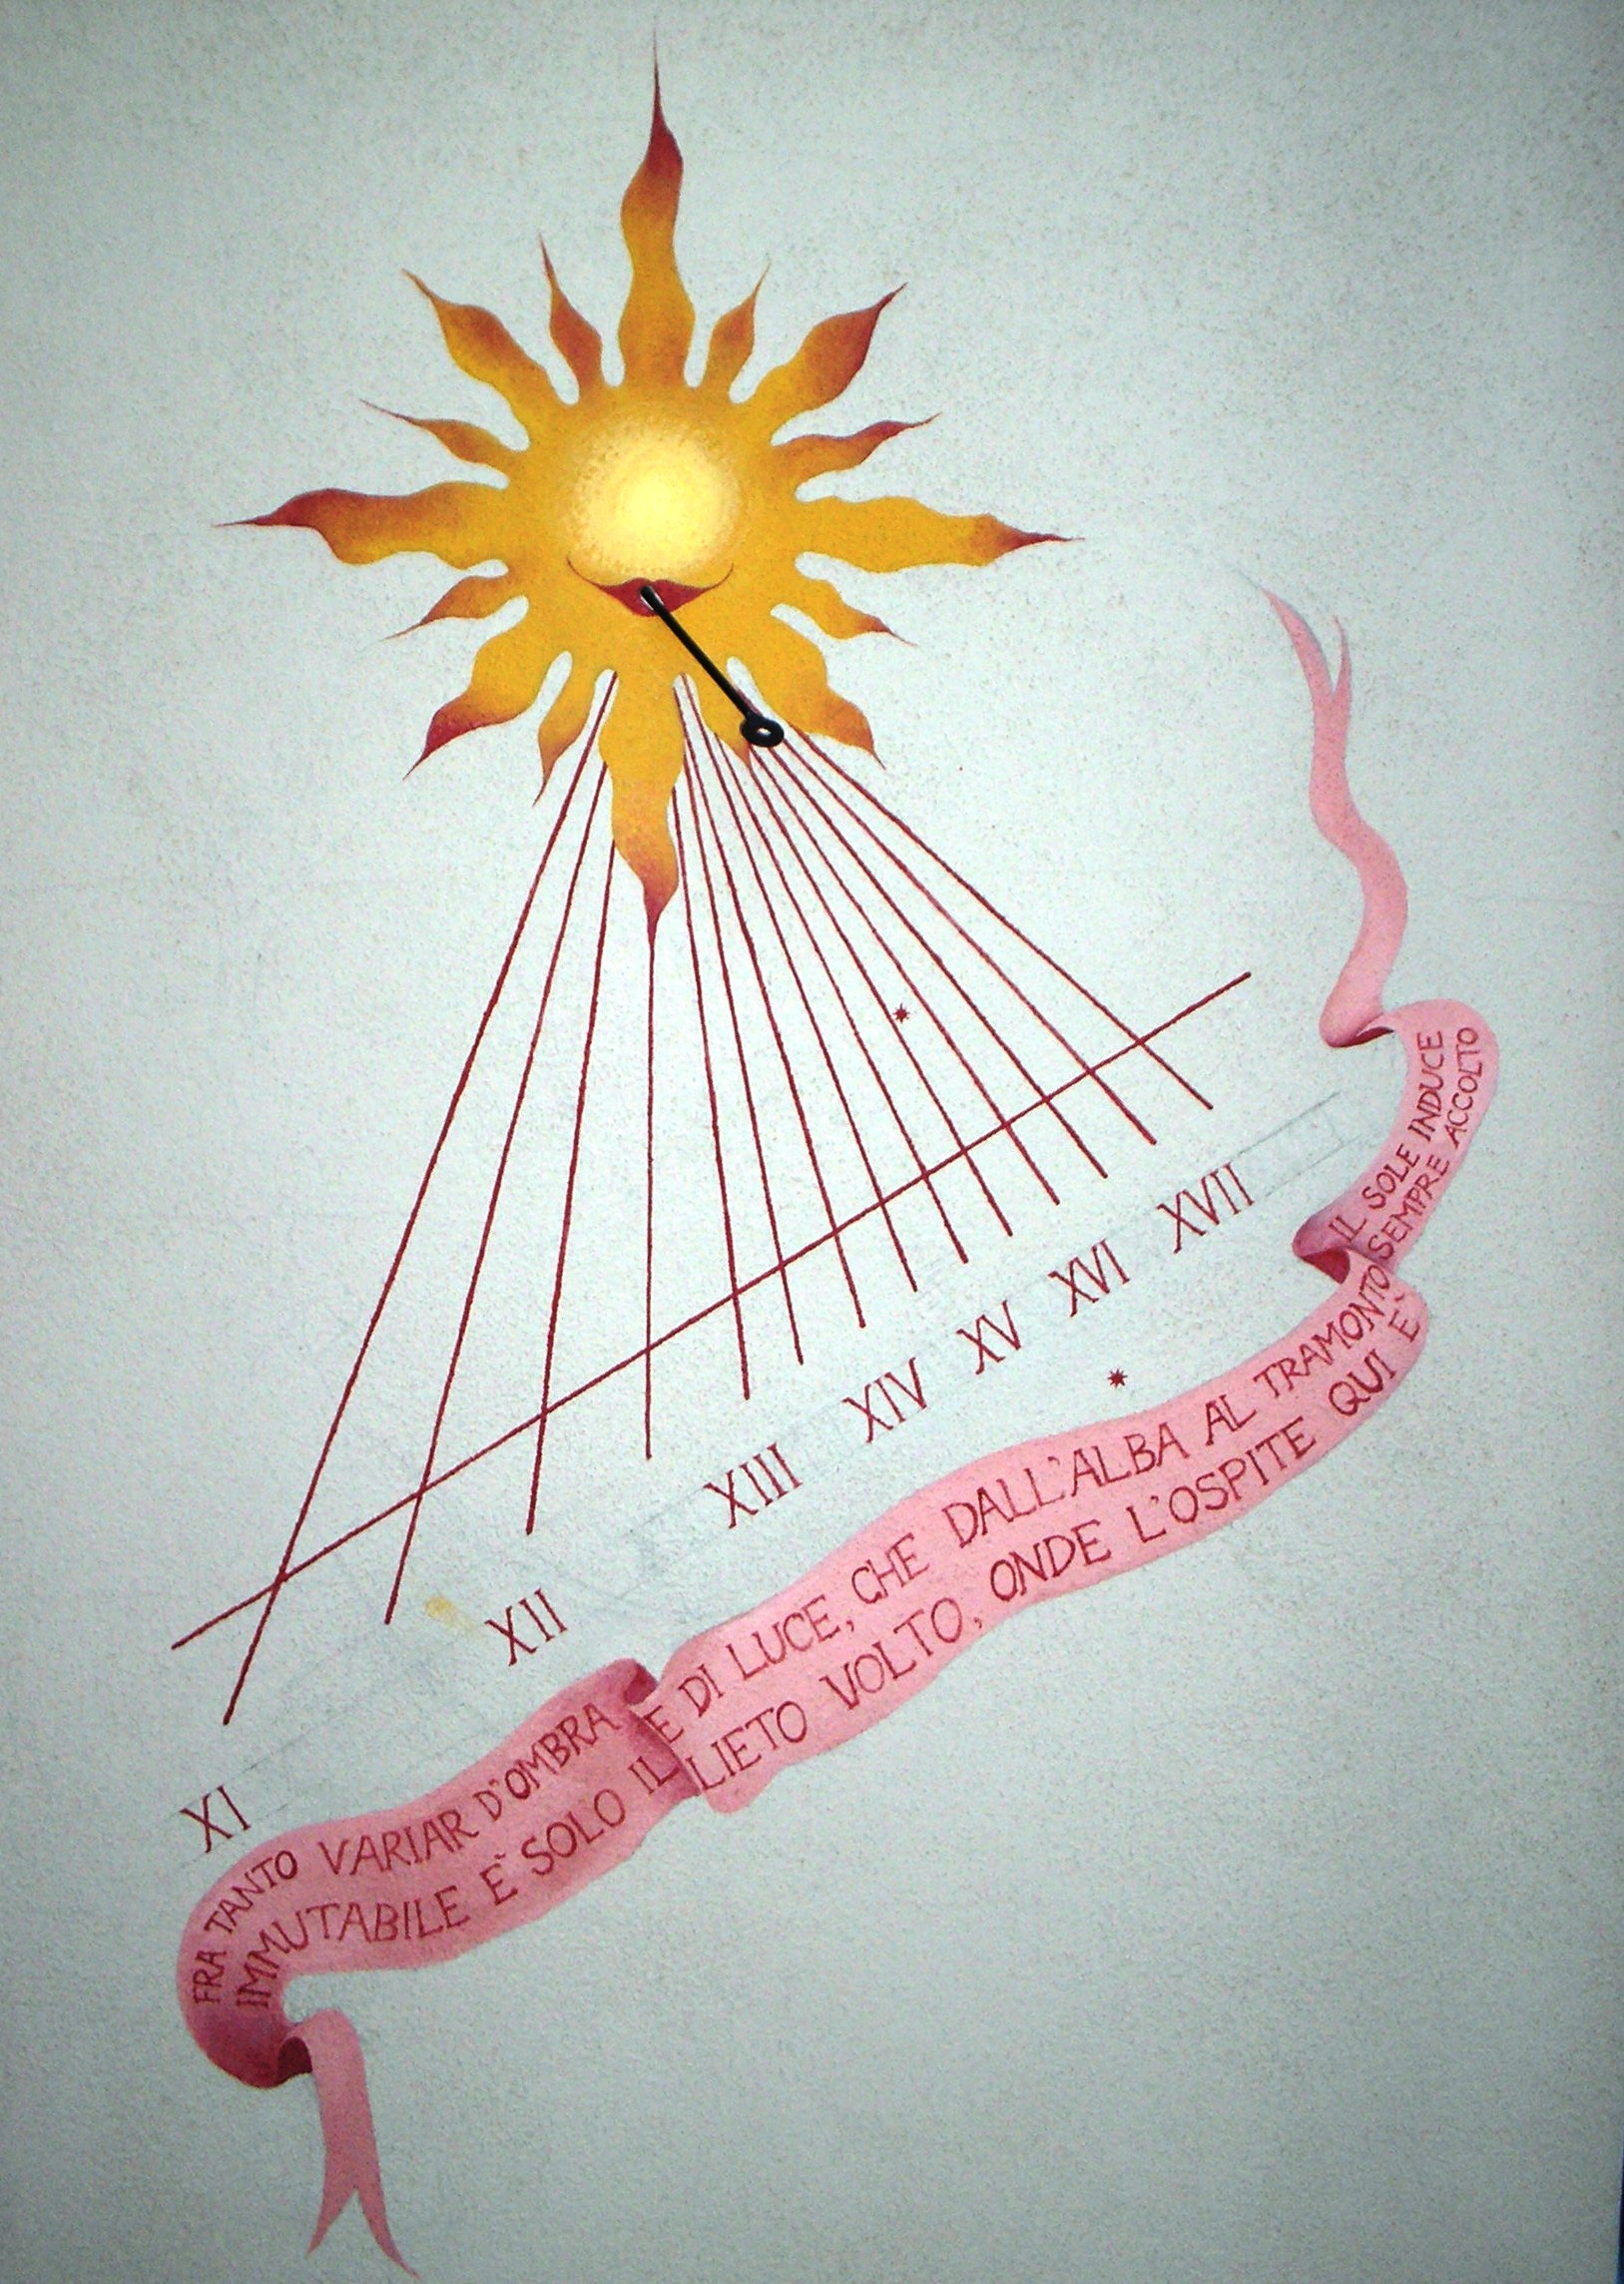 meridiana pontedera (pisa)